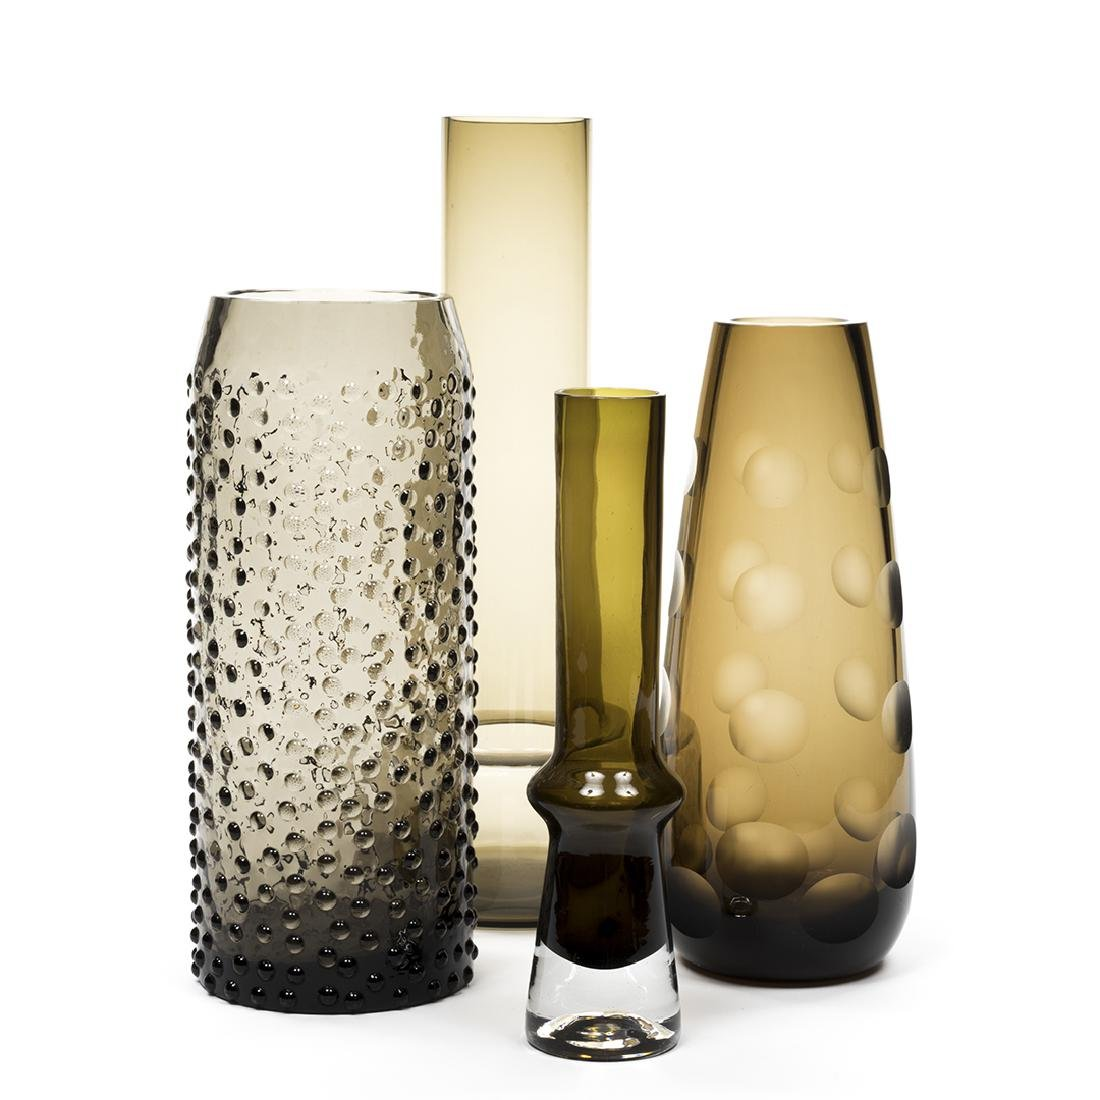 Modernist Smoked Glass (5) - 2